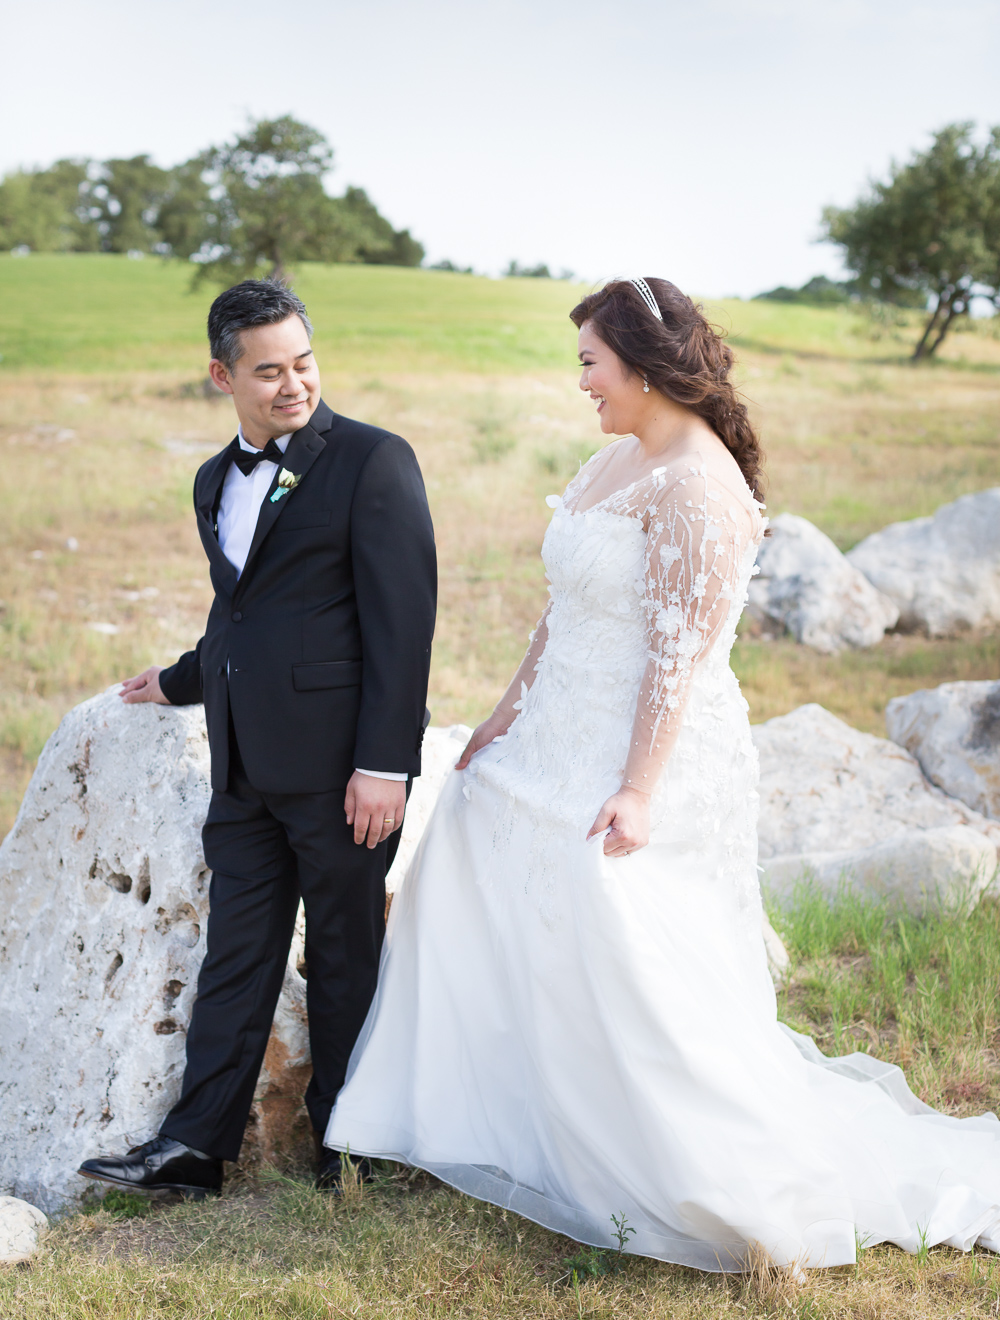 Wedding-photography-and-films-austin-093.jpg